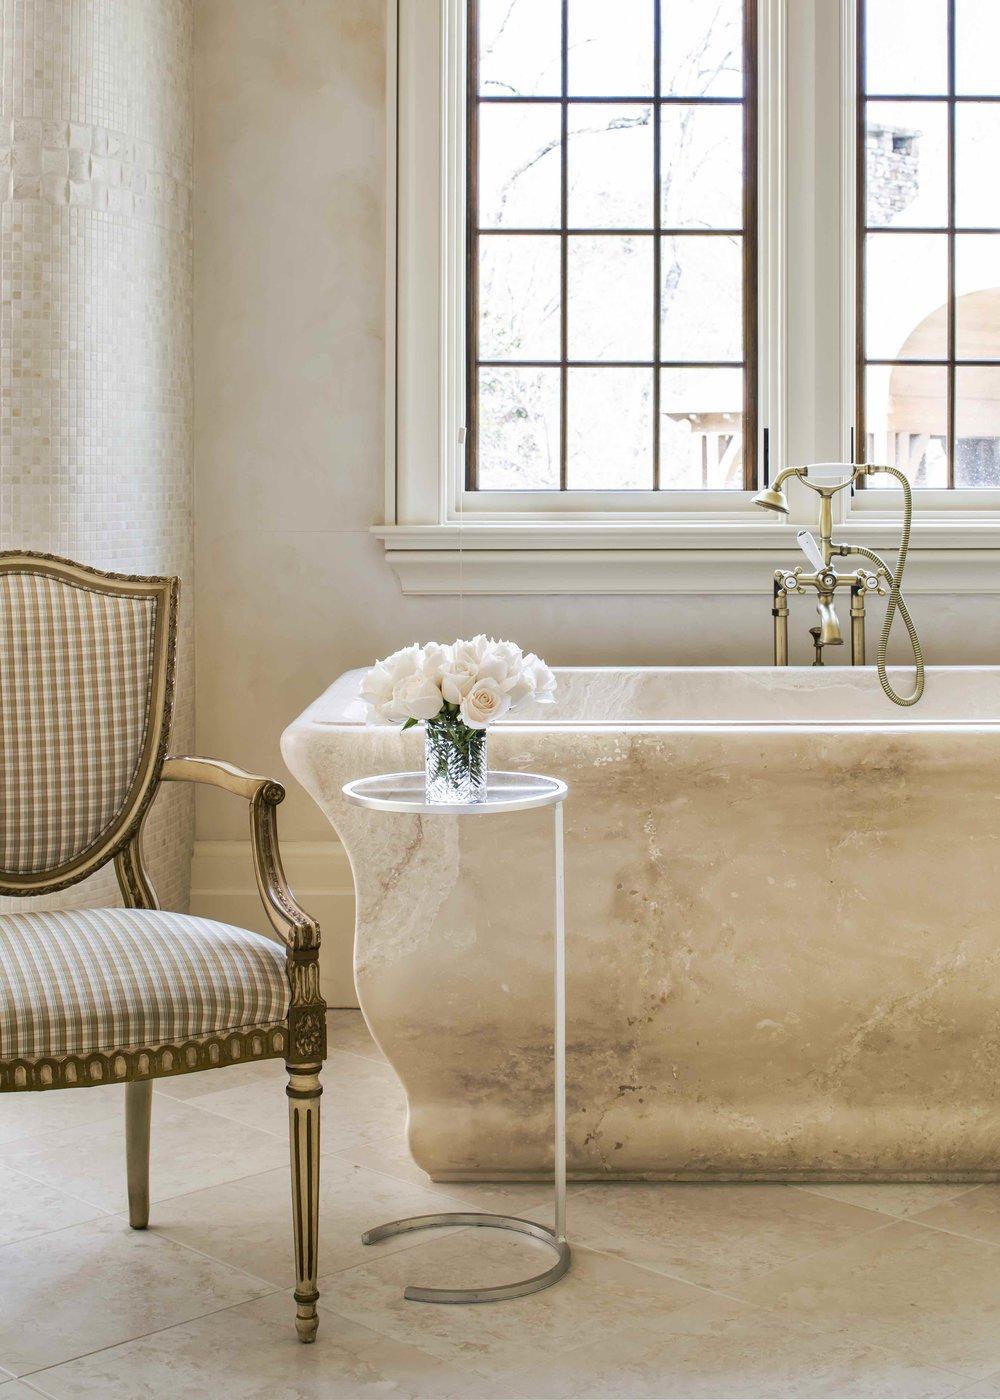 MDG - Master - Bath.JPG